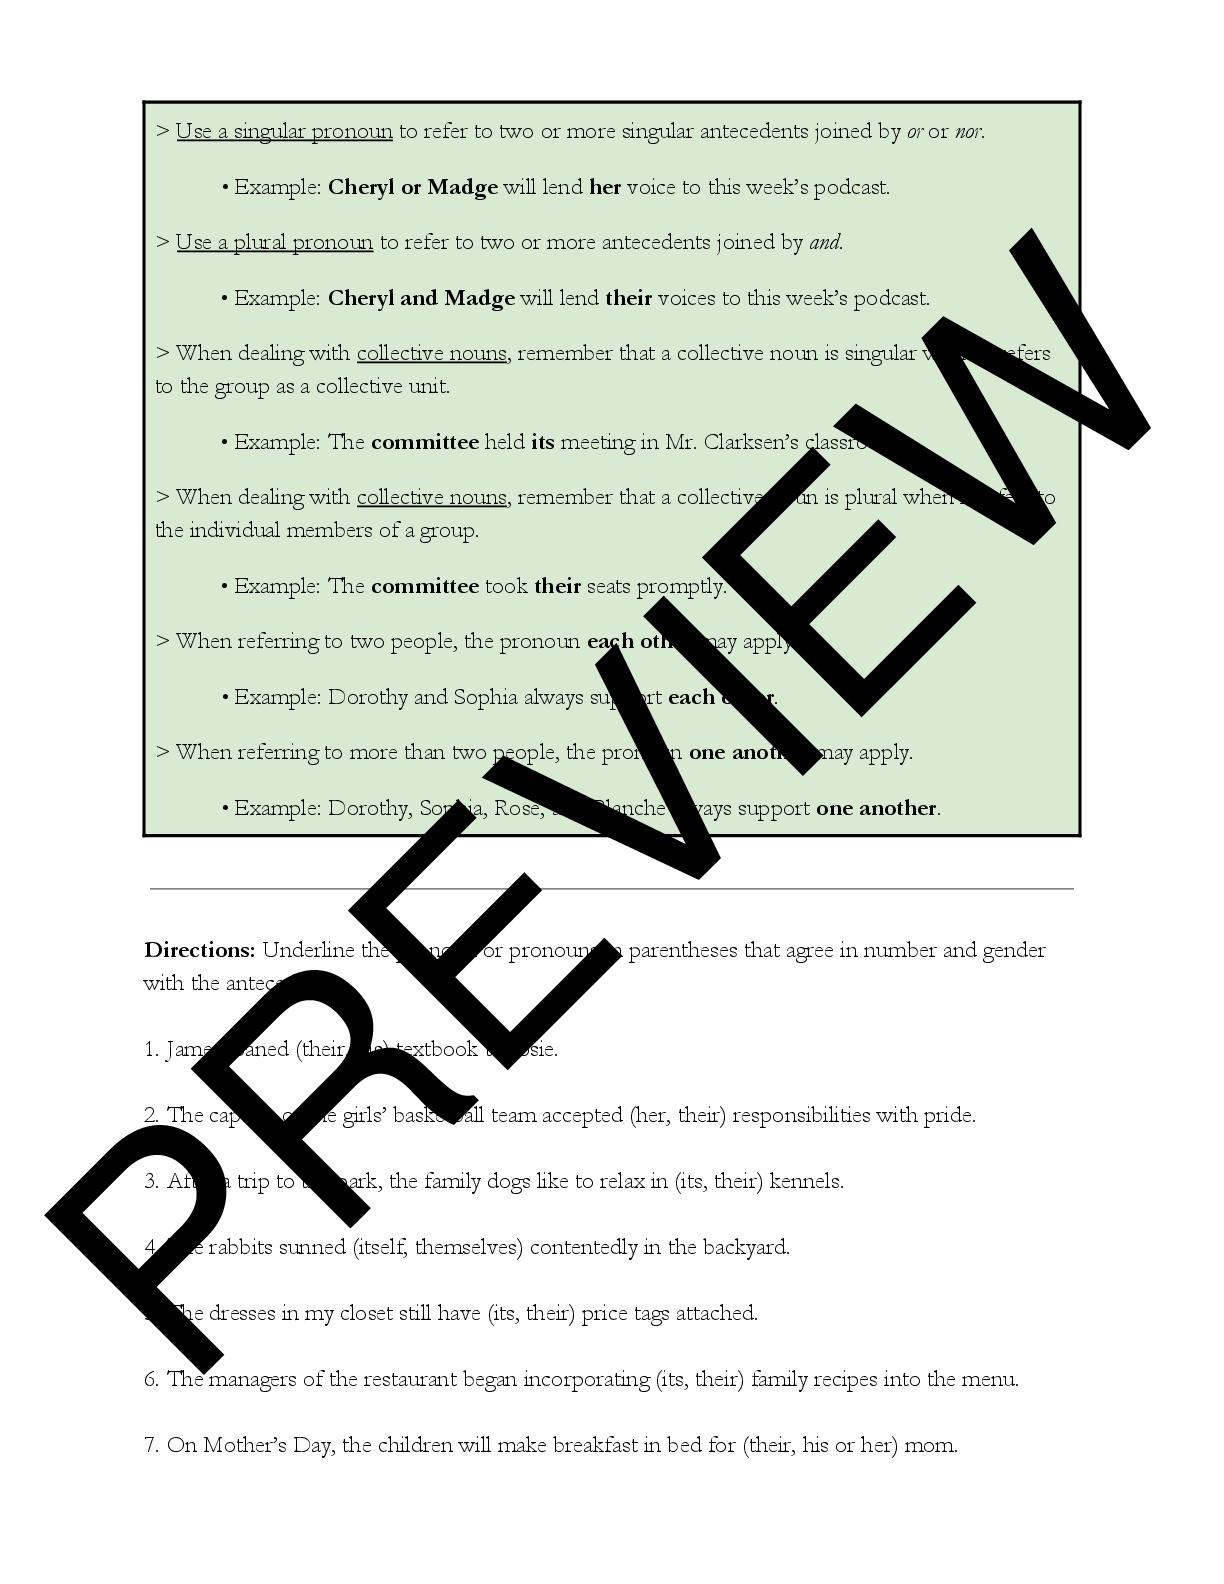 Grammar Worksheet on Pronoun-Antecedent Agreement  Teaching Resources Within Pronoun Antecedent Agreement Worksheet